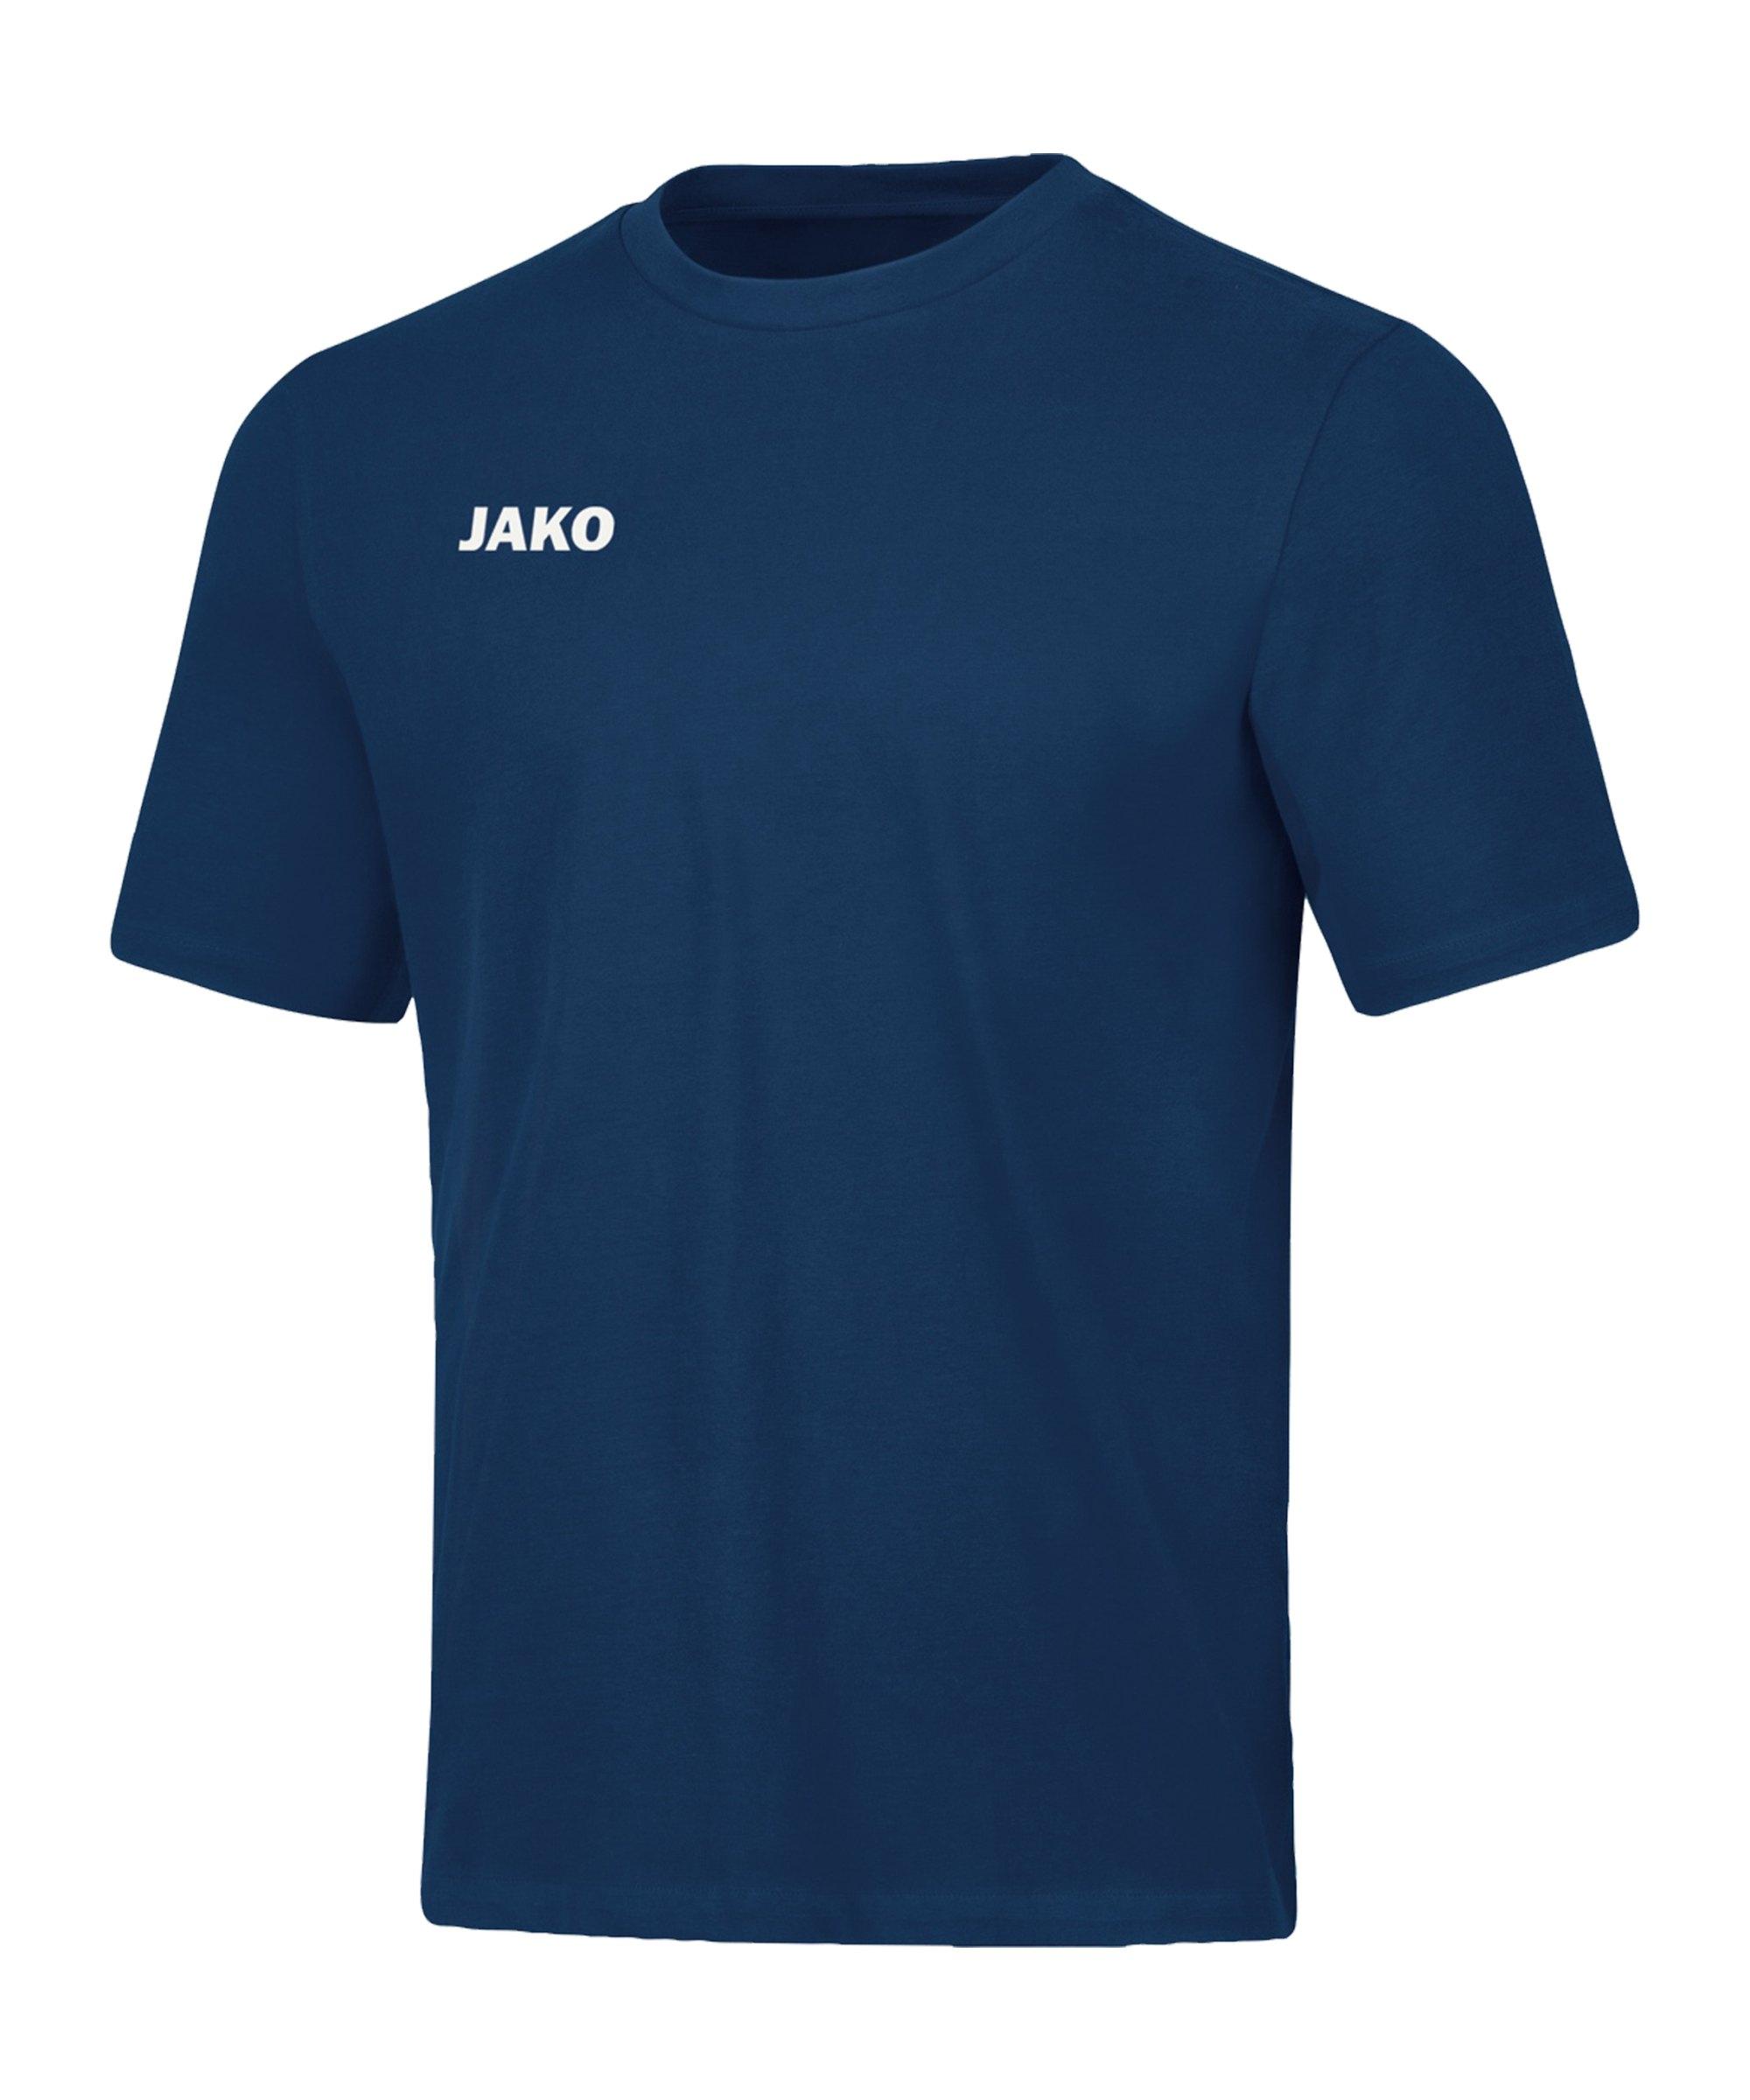 JAKO Base T-Shirt Blau F09 - blau